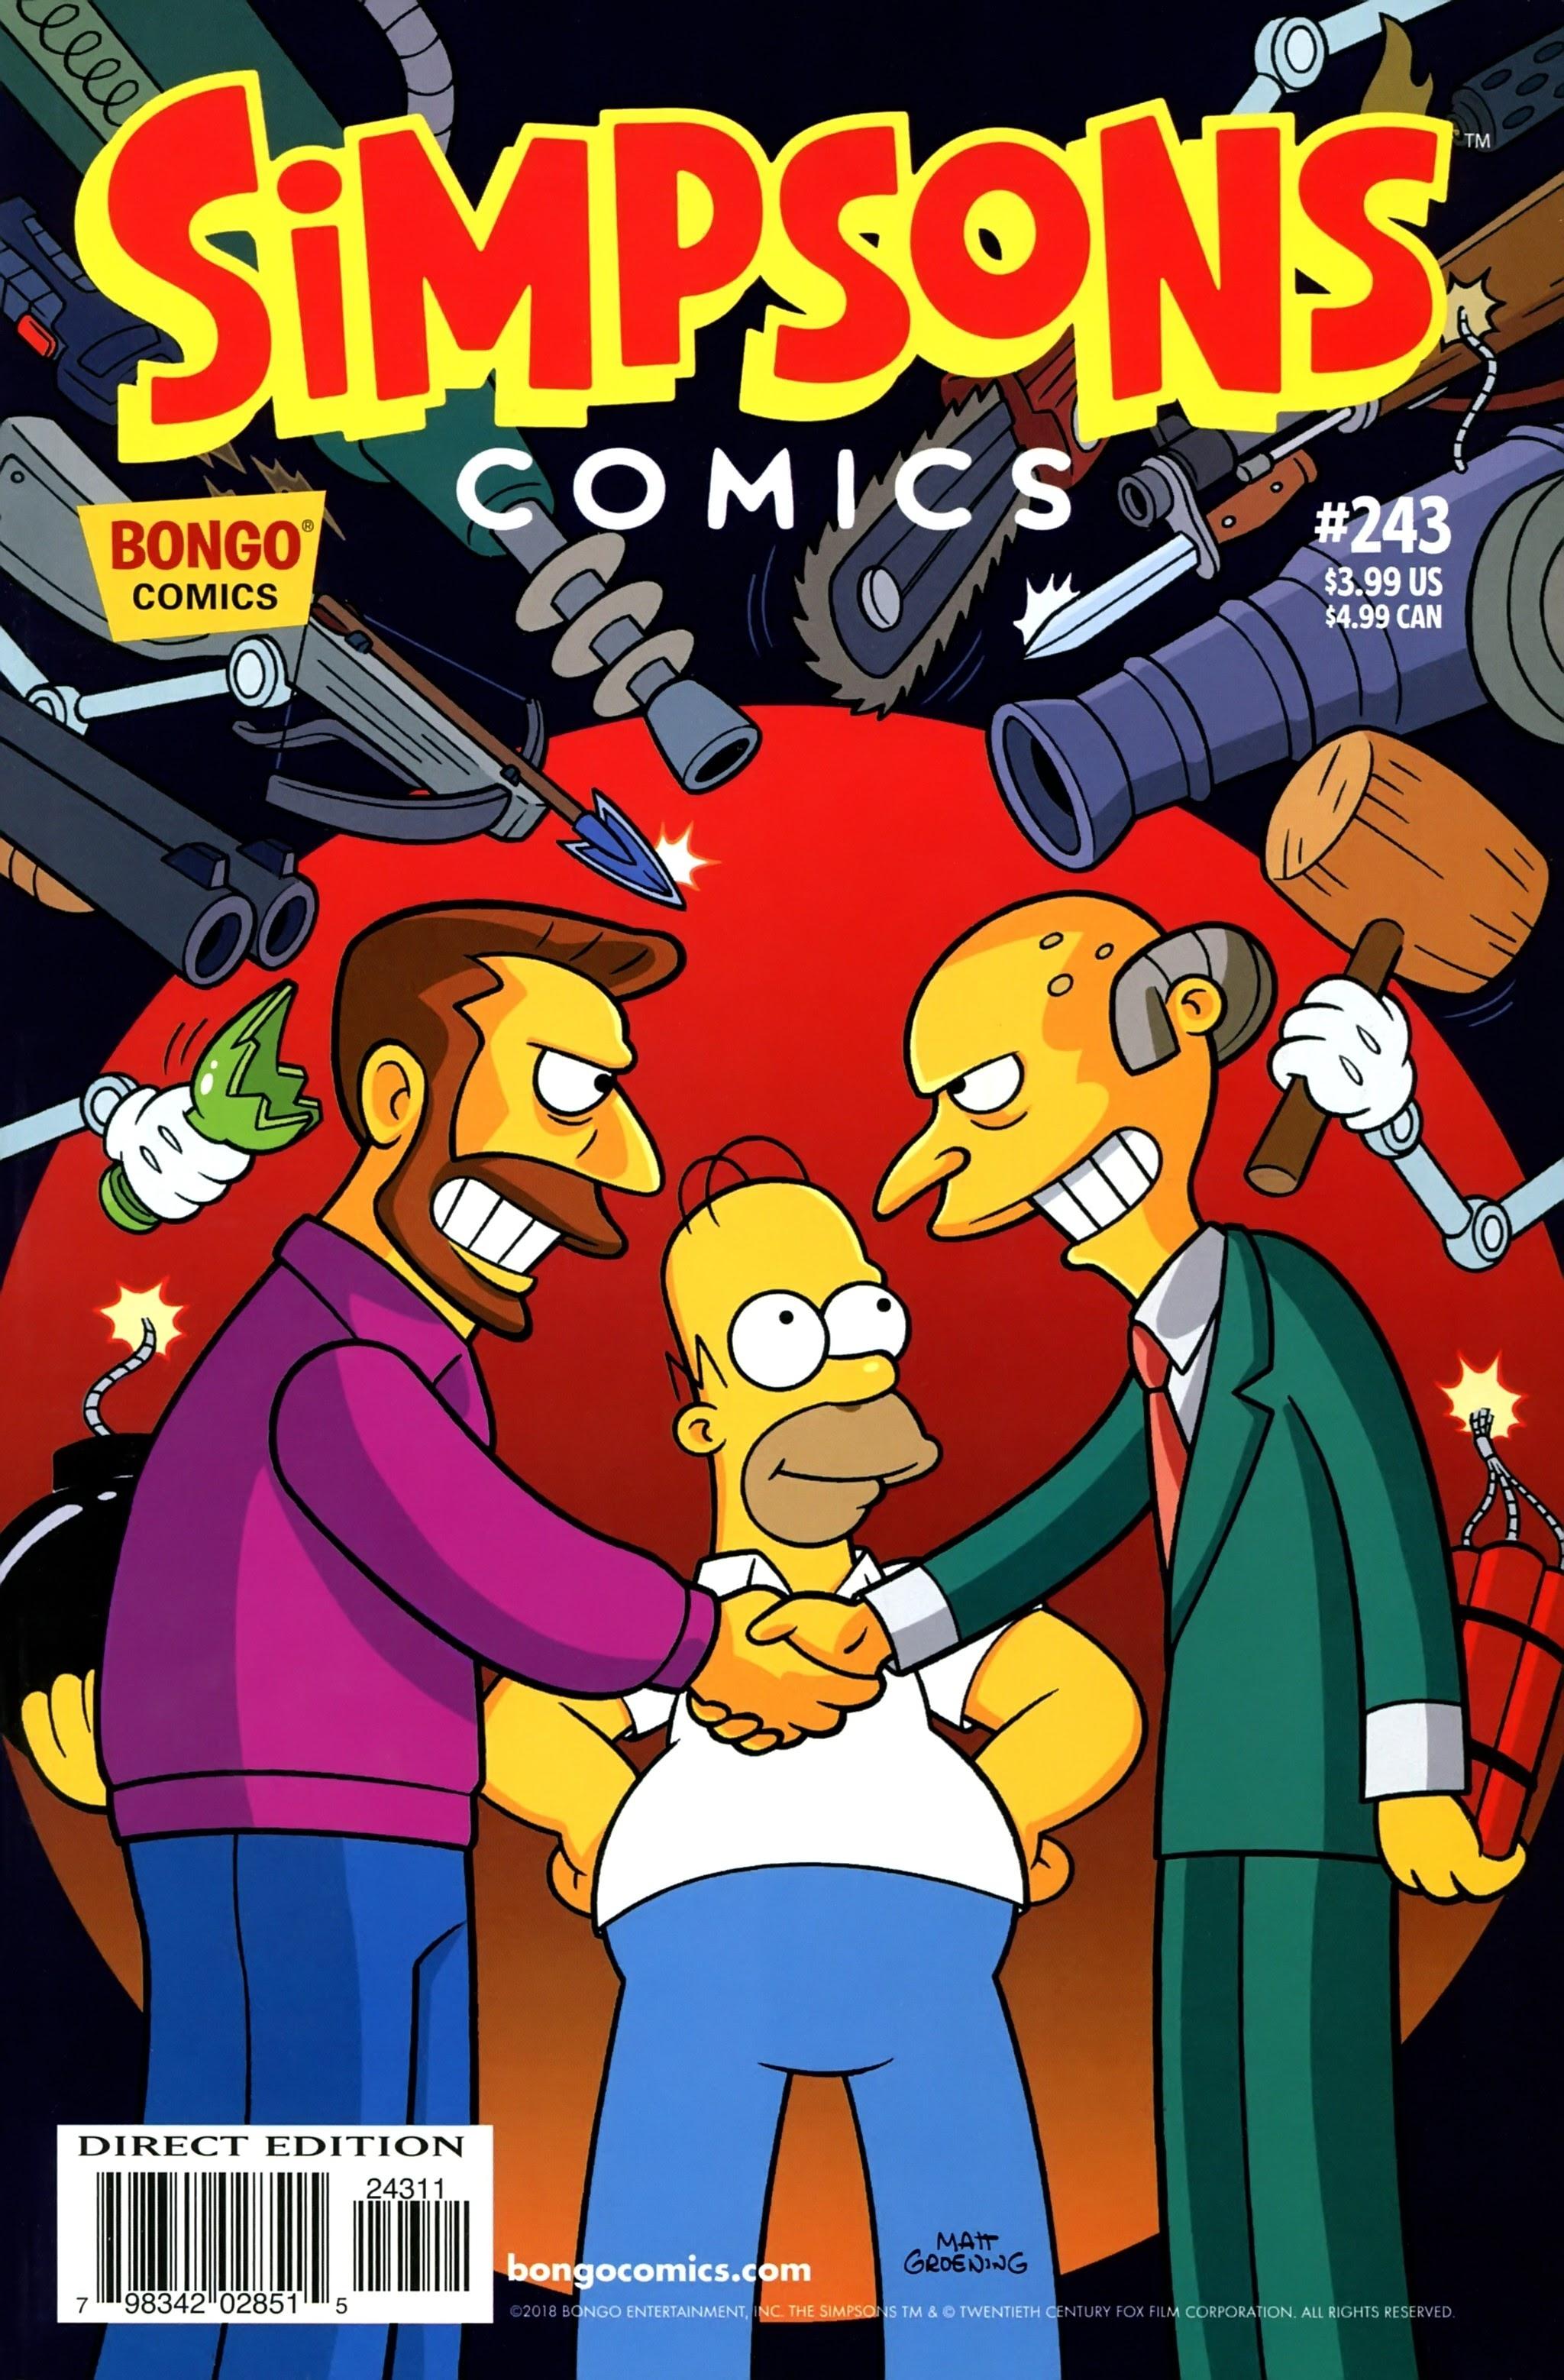 Simpsons Comics 243 Page 1